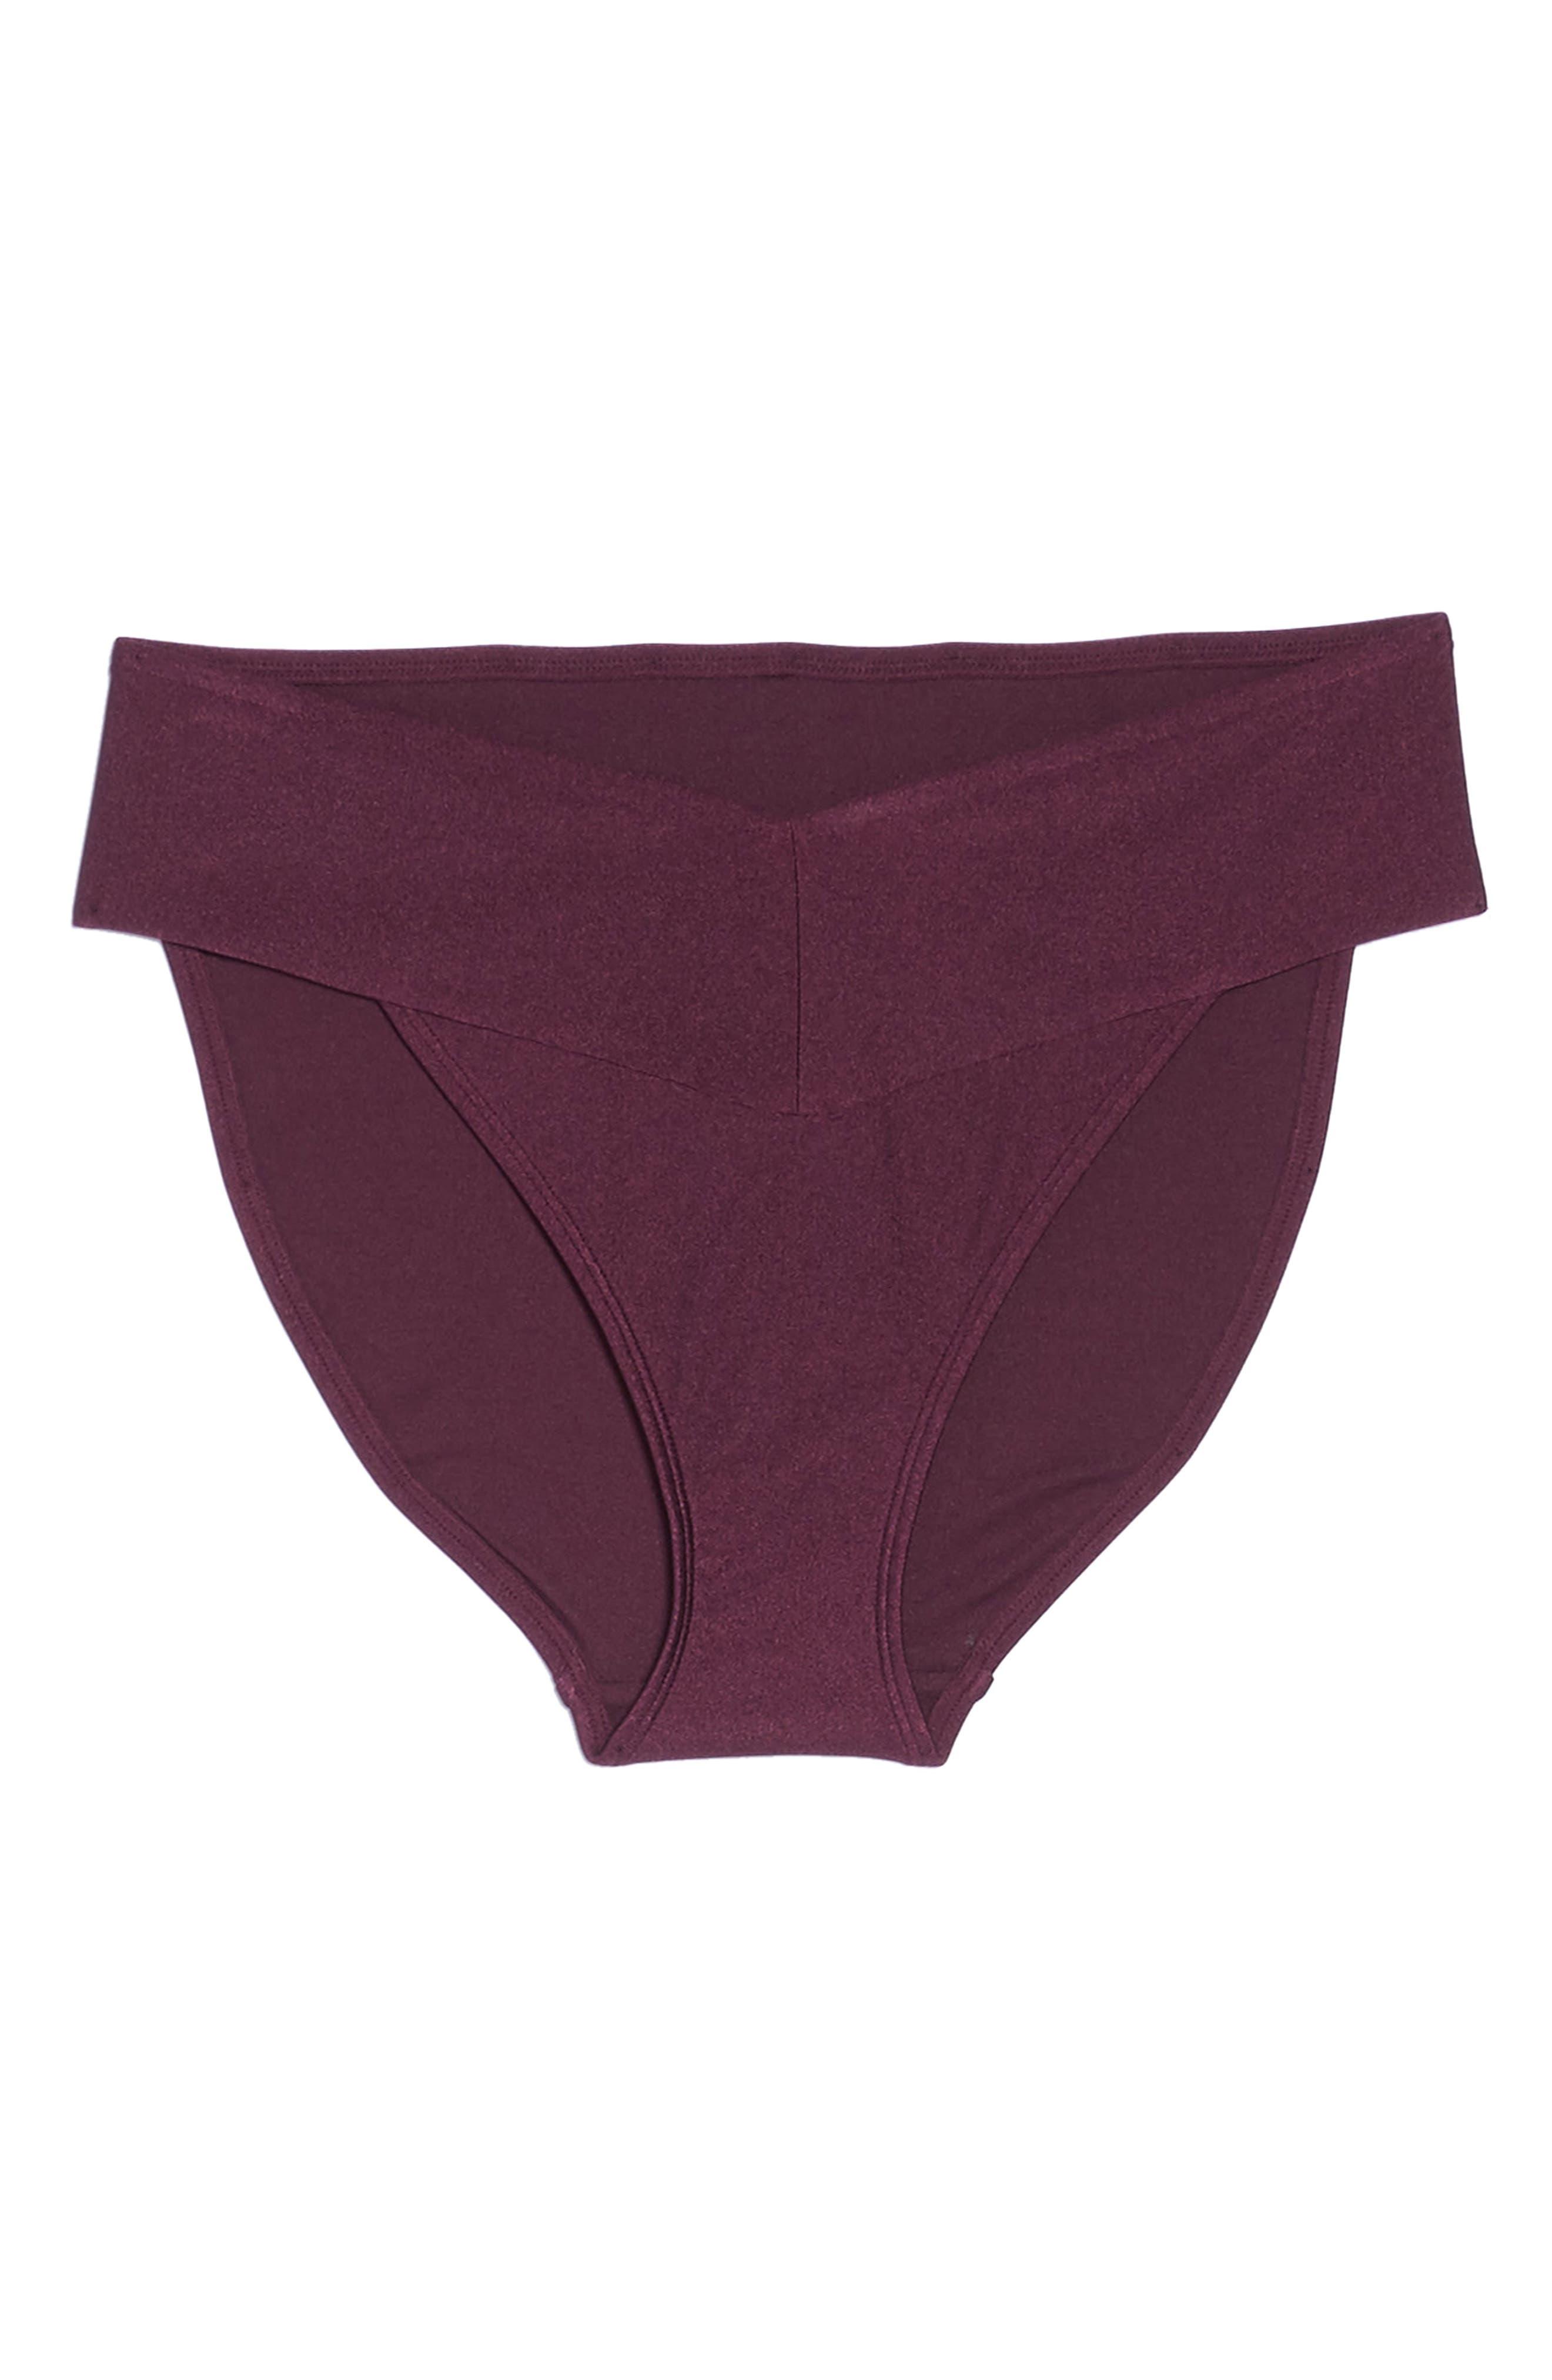 Ted Baker High Waisted Wrap Bikini Bottom,                             Alternate thumbnail 6, color,                             DEEP PURPLE